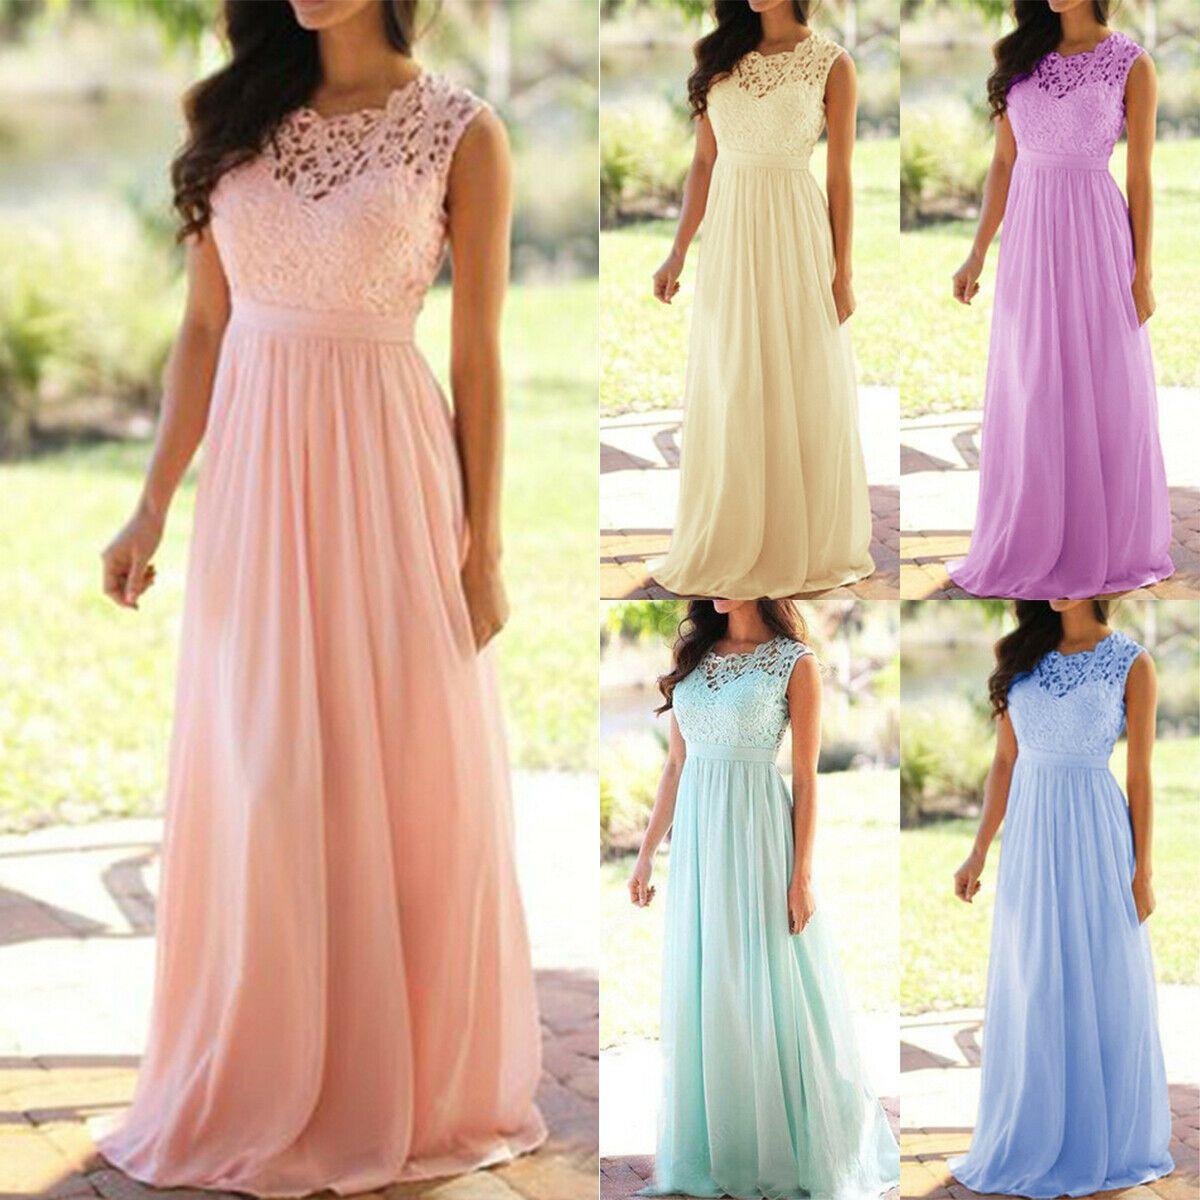 Formal Großartig Abendkleid Damen Lang BoutiqueDesigner Ausgezeichnet Abendkleid Damen Lang für 2019